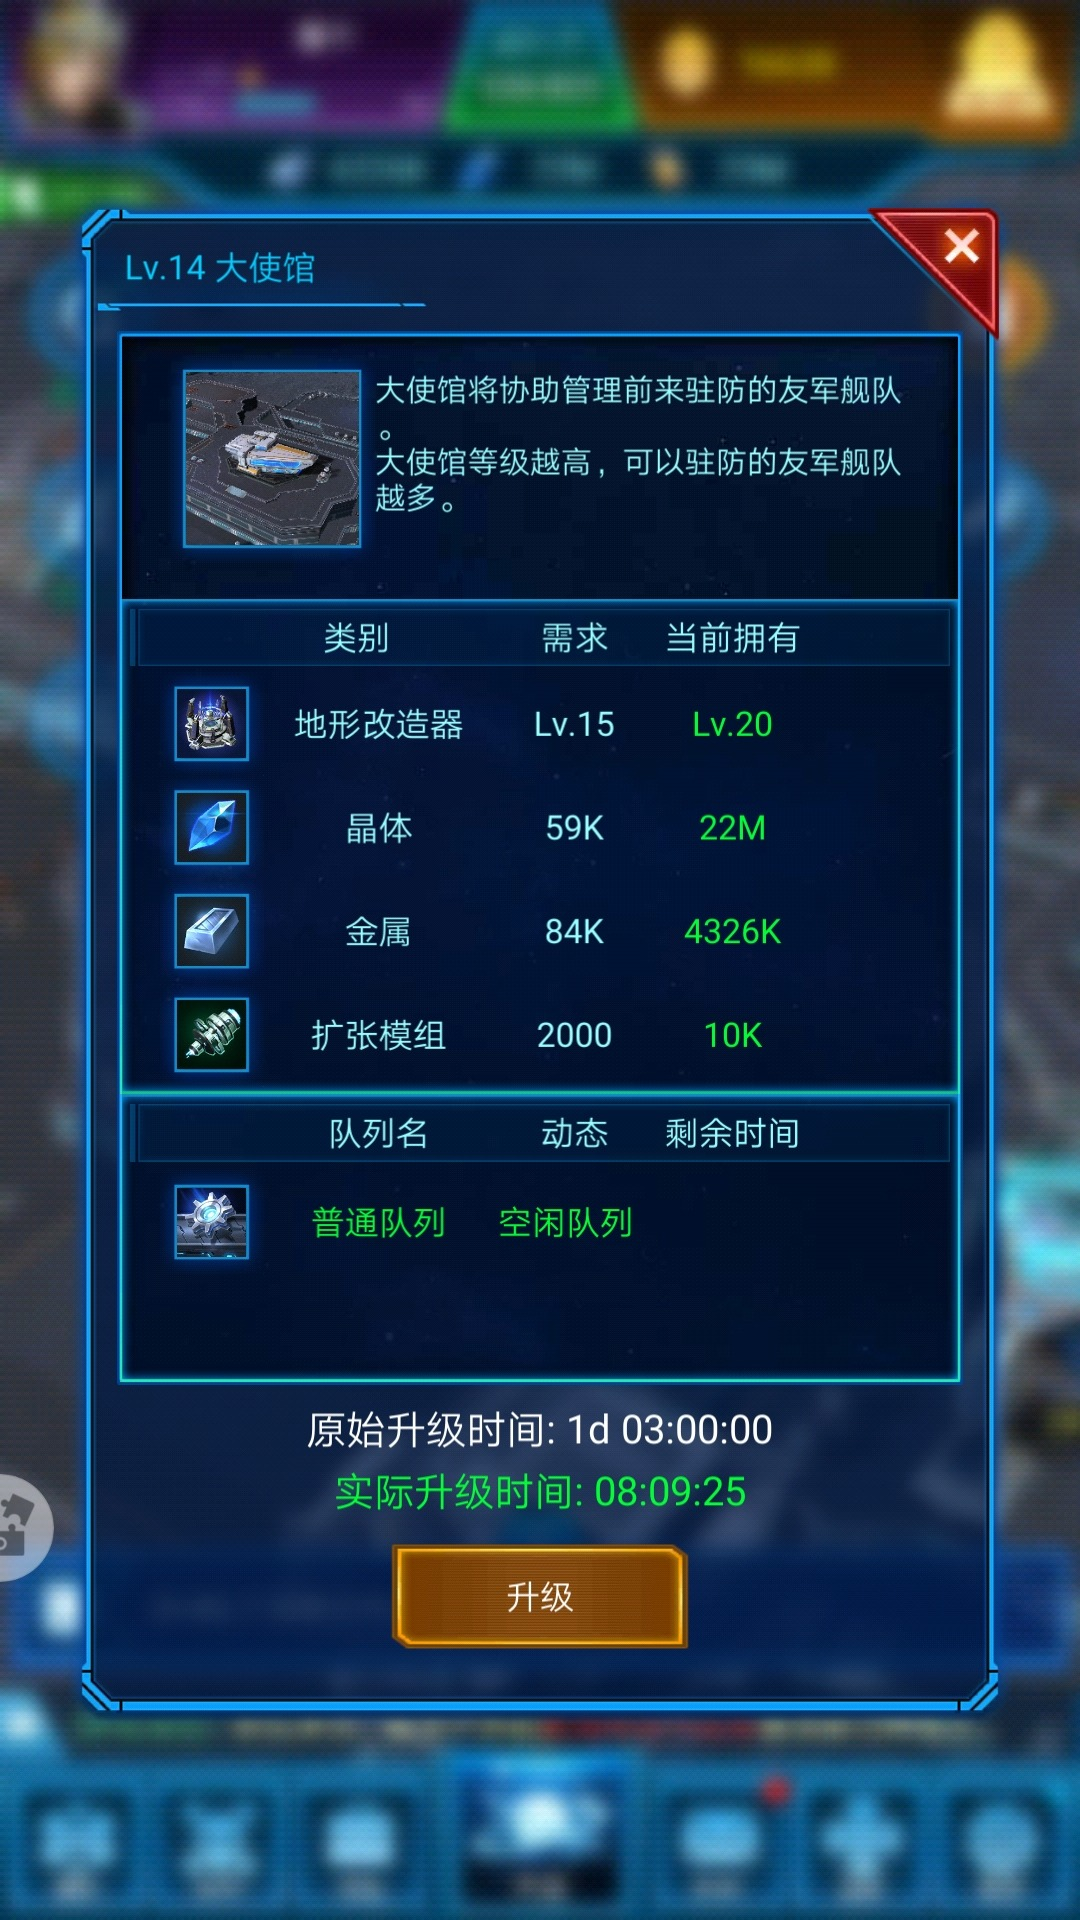 Screenshot_20190904_064148_com.jedigames.p16s.huawei.jpg